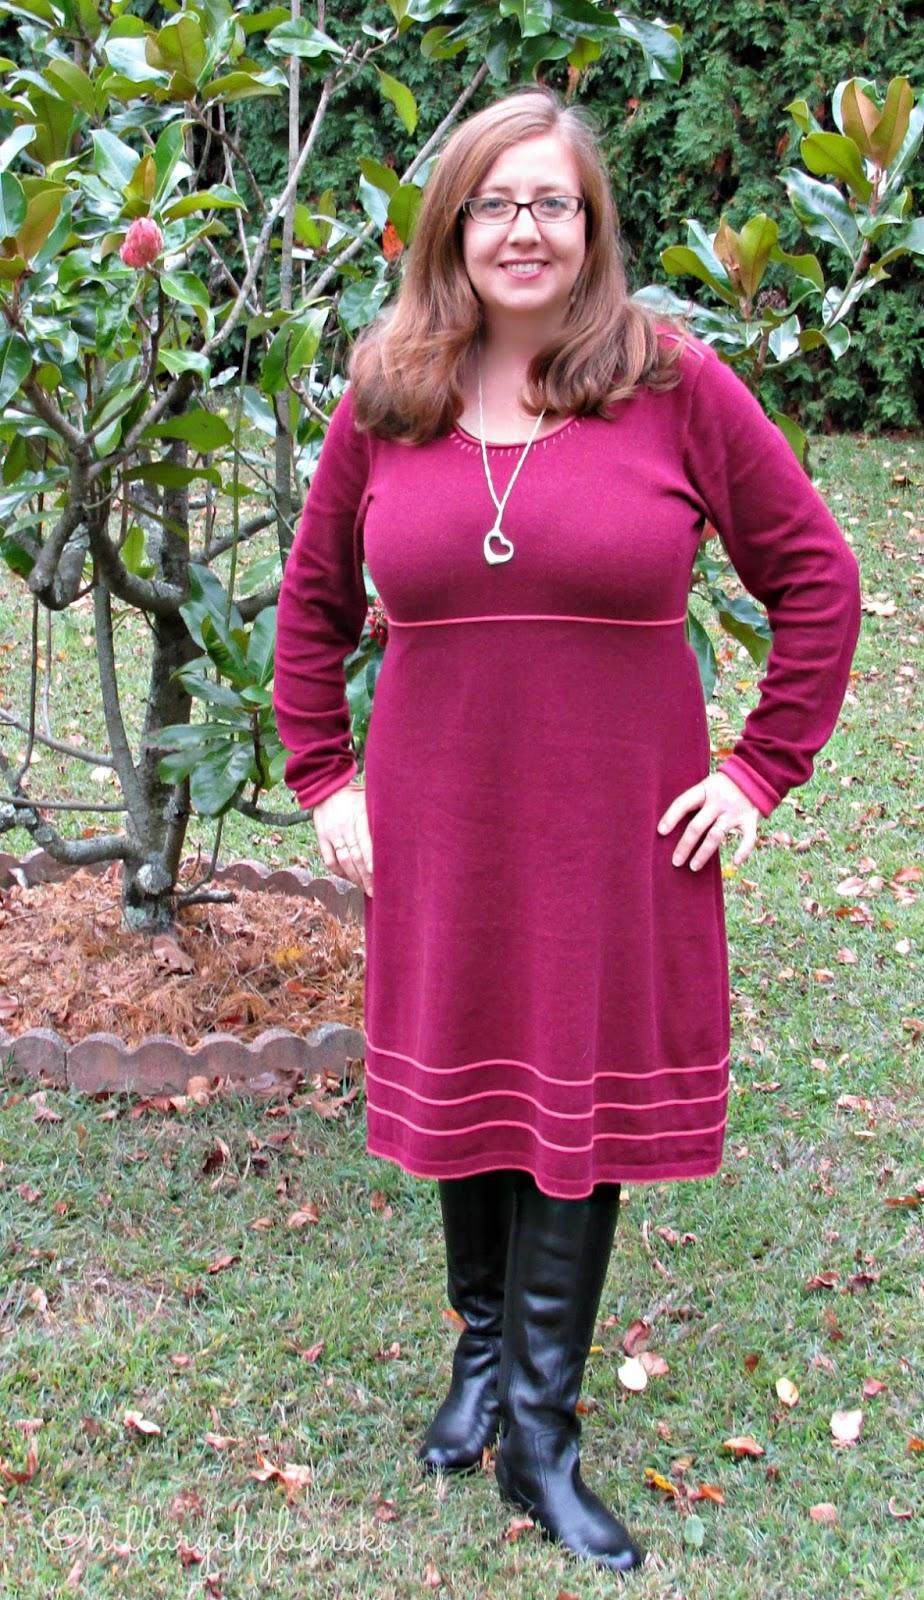 Merlot Knit Dress From Aventura Clothing